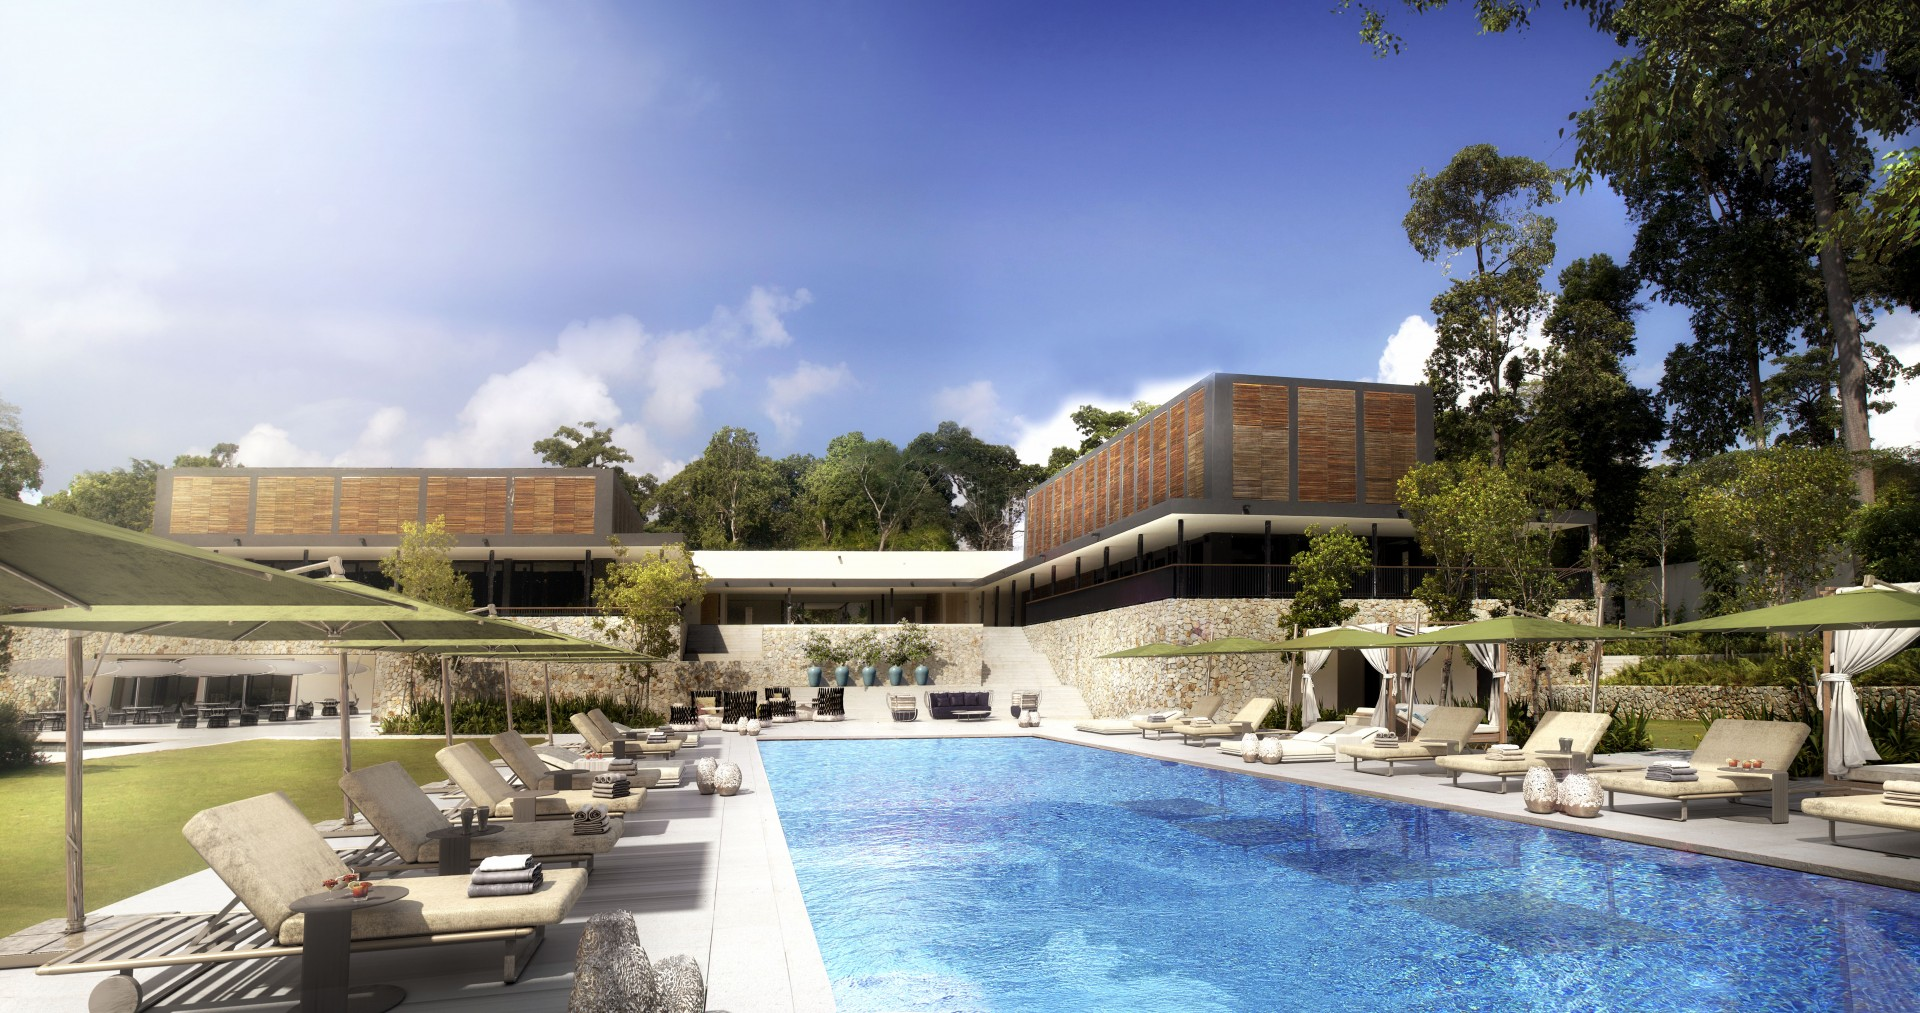 1920_oodc-resort-exterior-pool